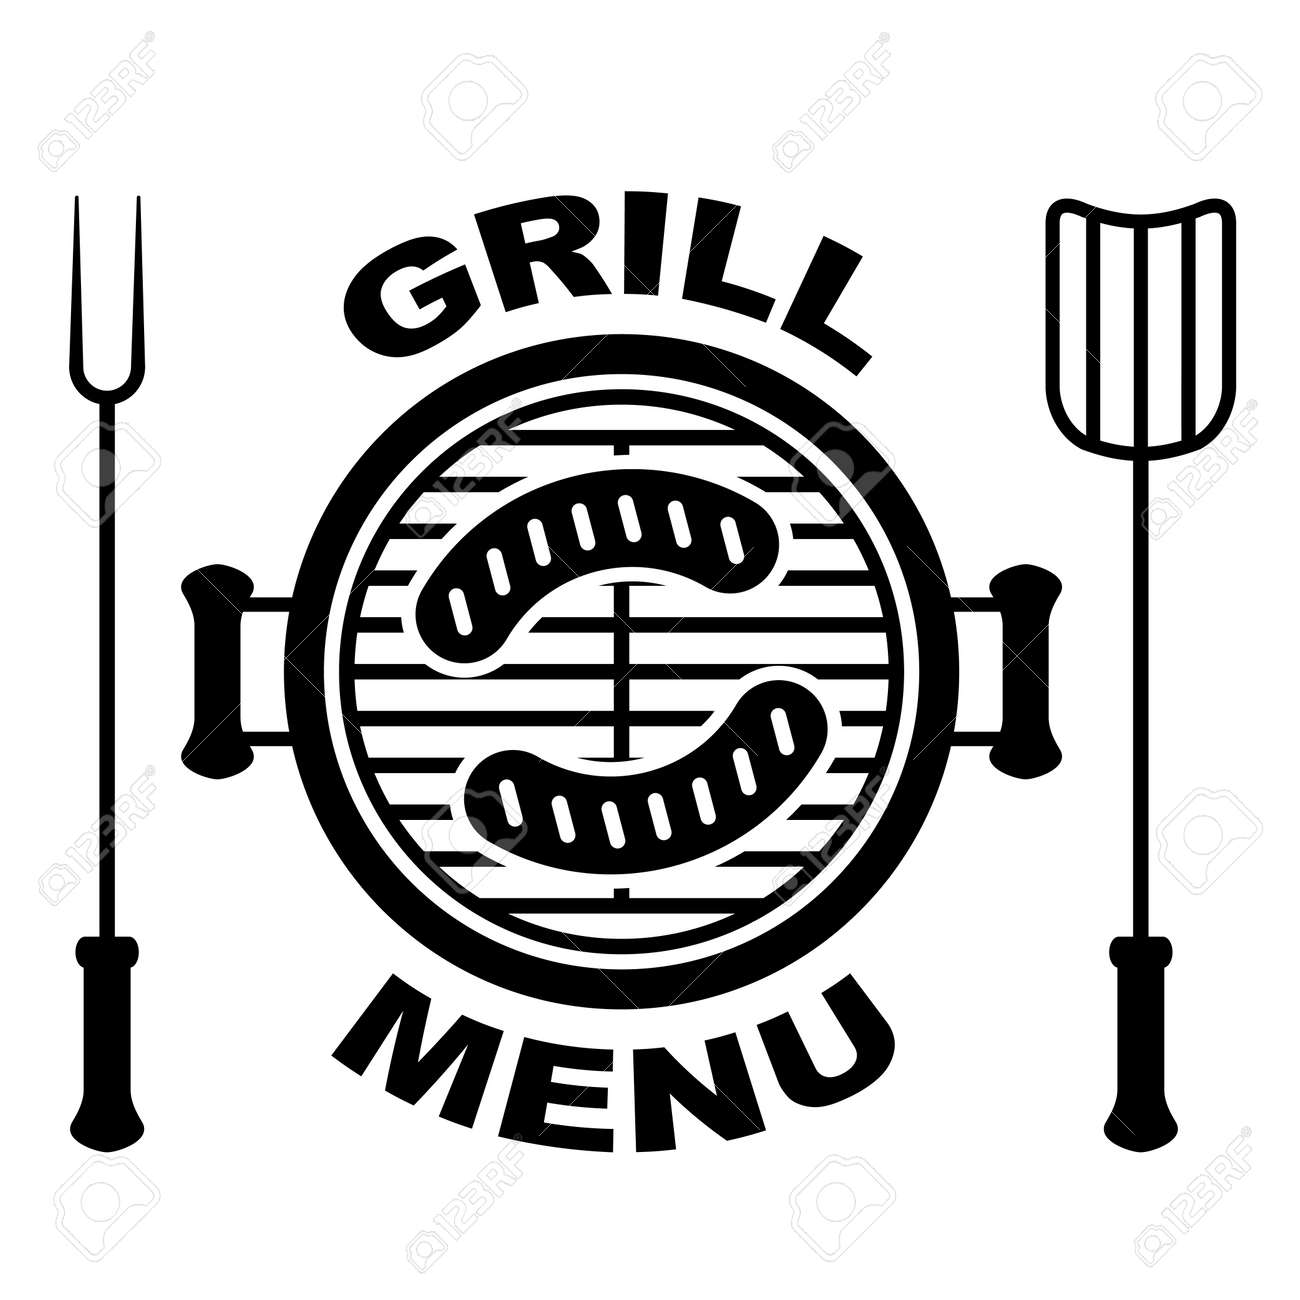 grill menu symbol - 14940808